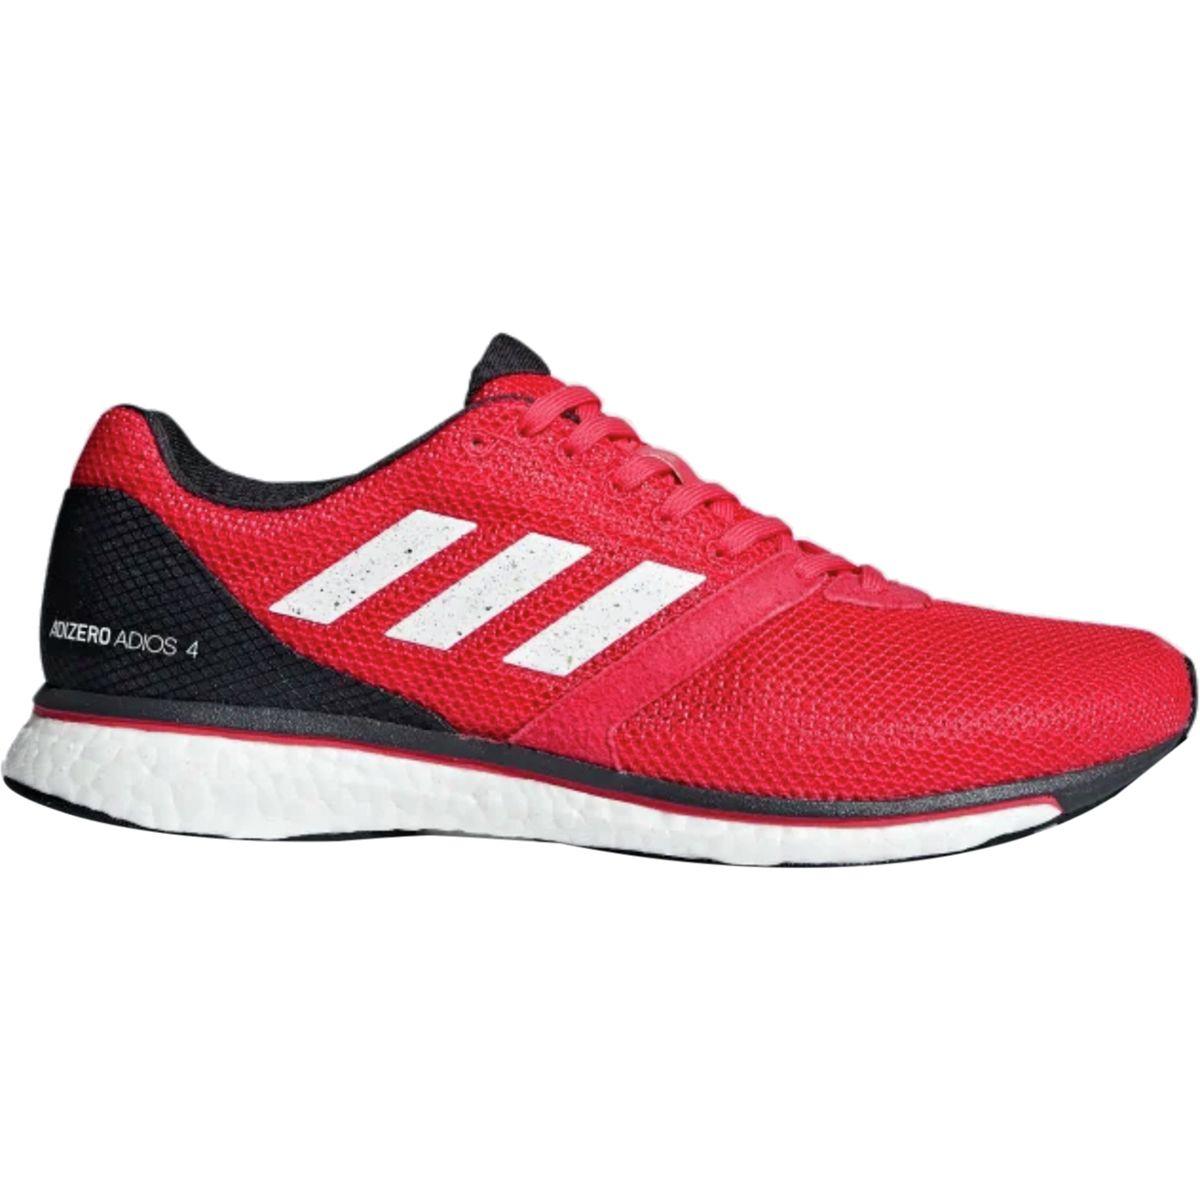 Adidas Adizero Adios Boost 3 Running Shoe Mens